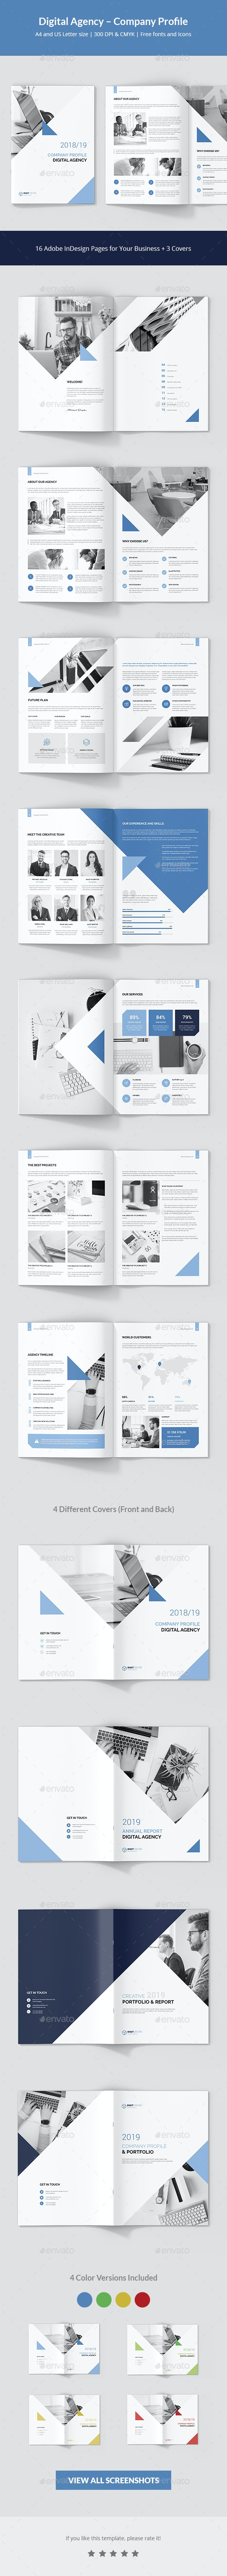 Digital Agency – Company Profile - Corporate Brochures